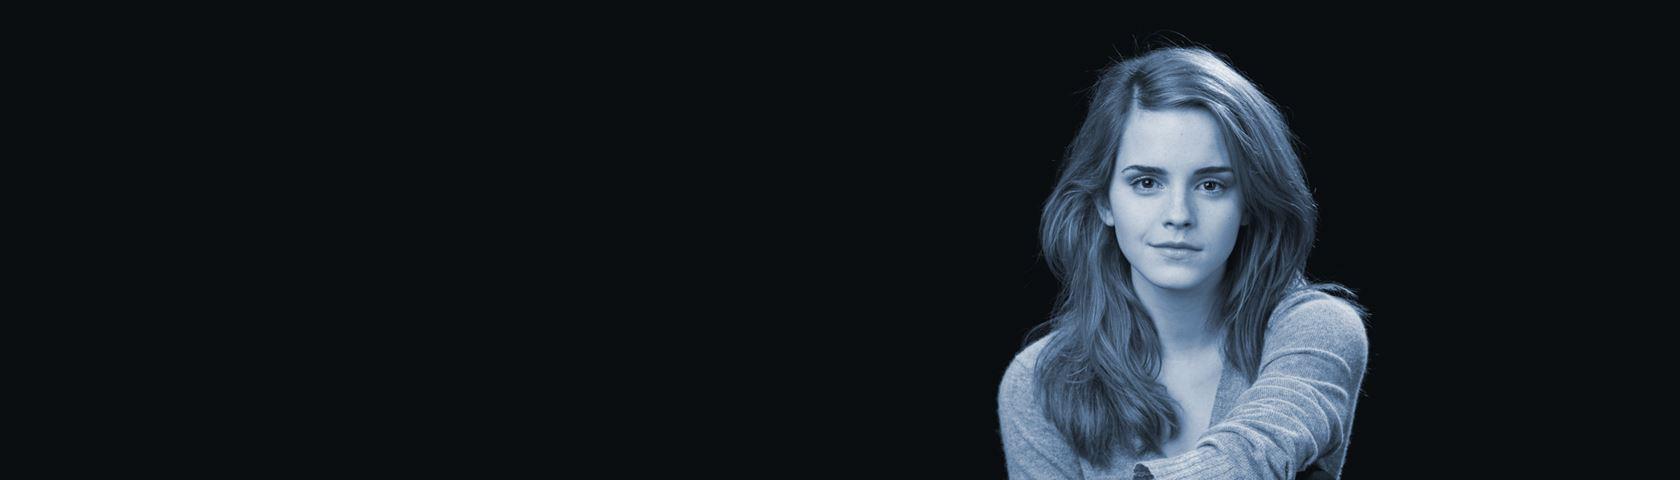 Emma Watson Blue